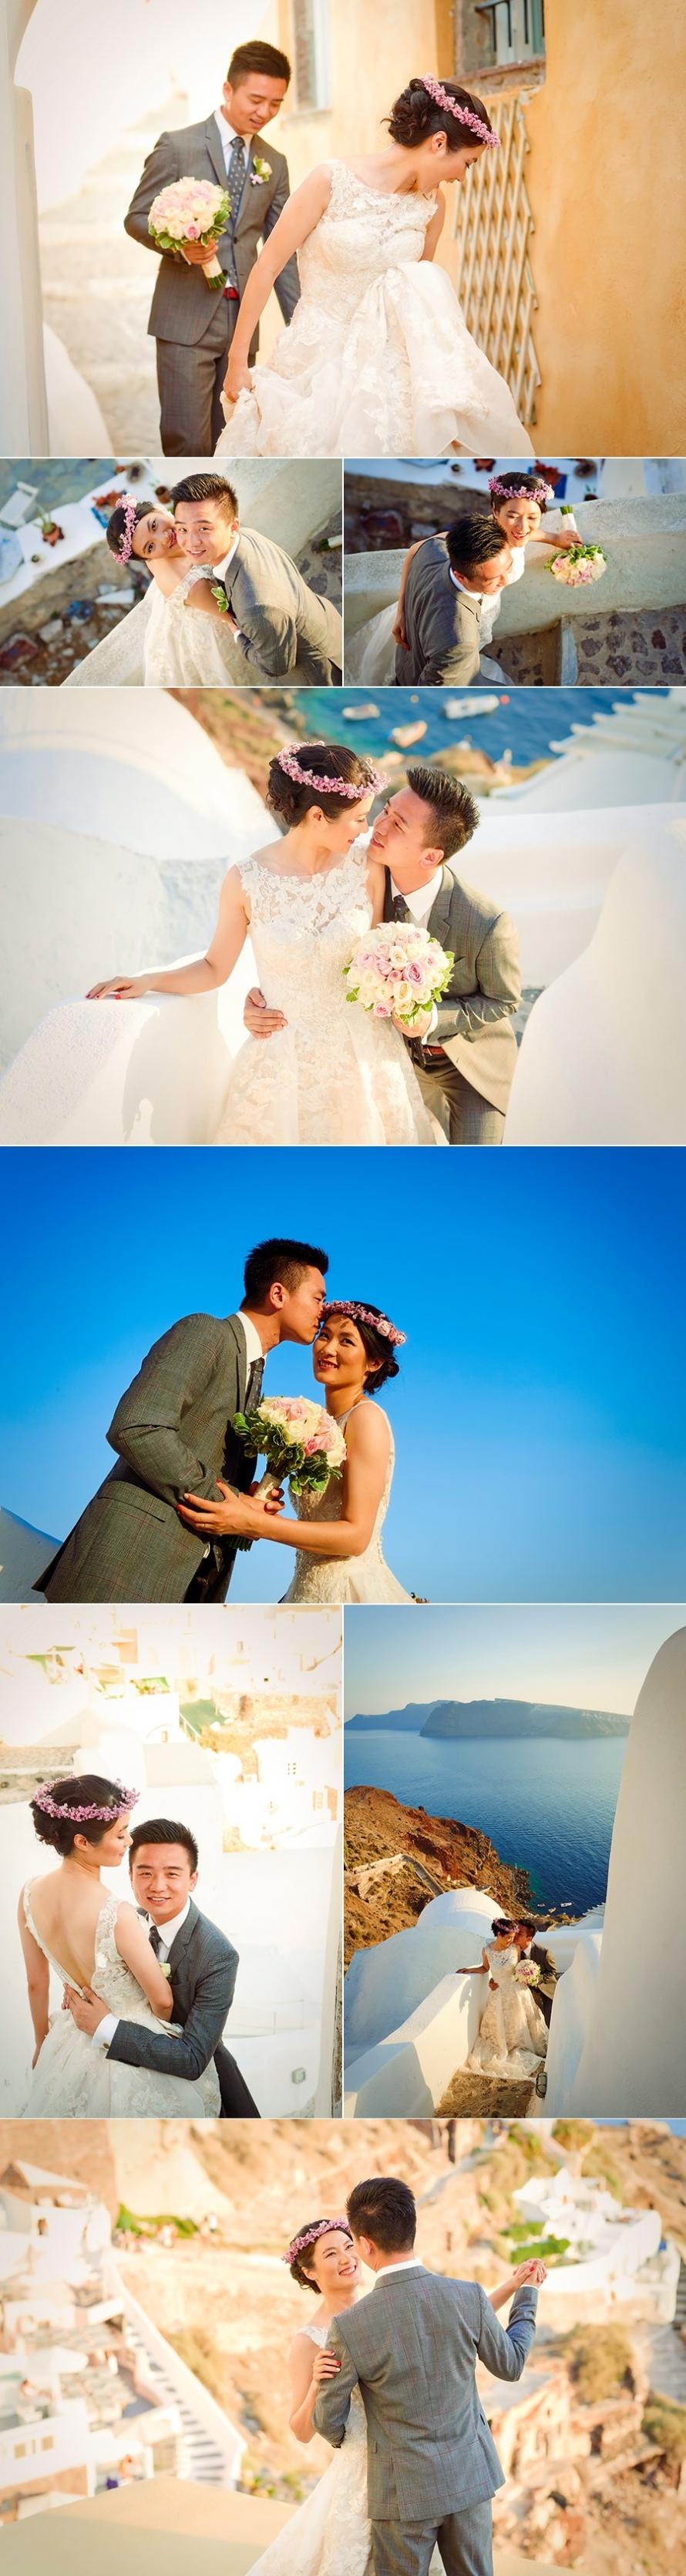 Omi Lili wedding photo05